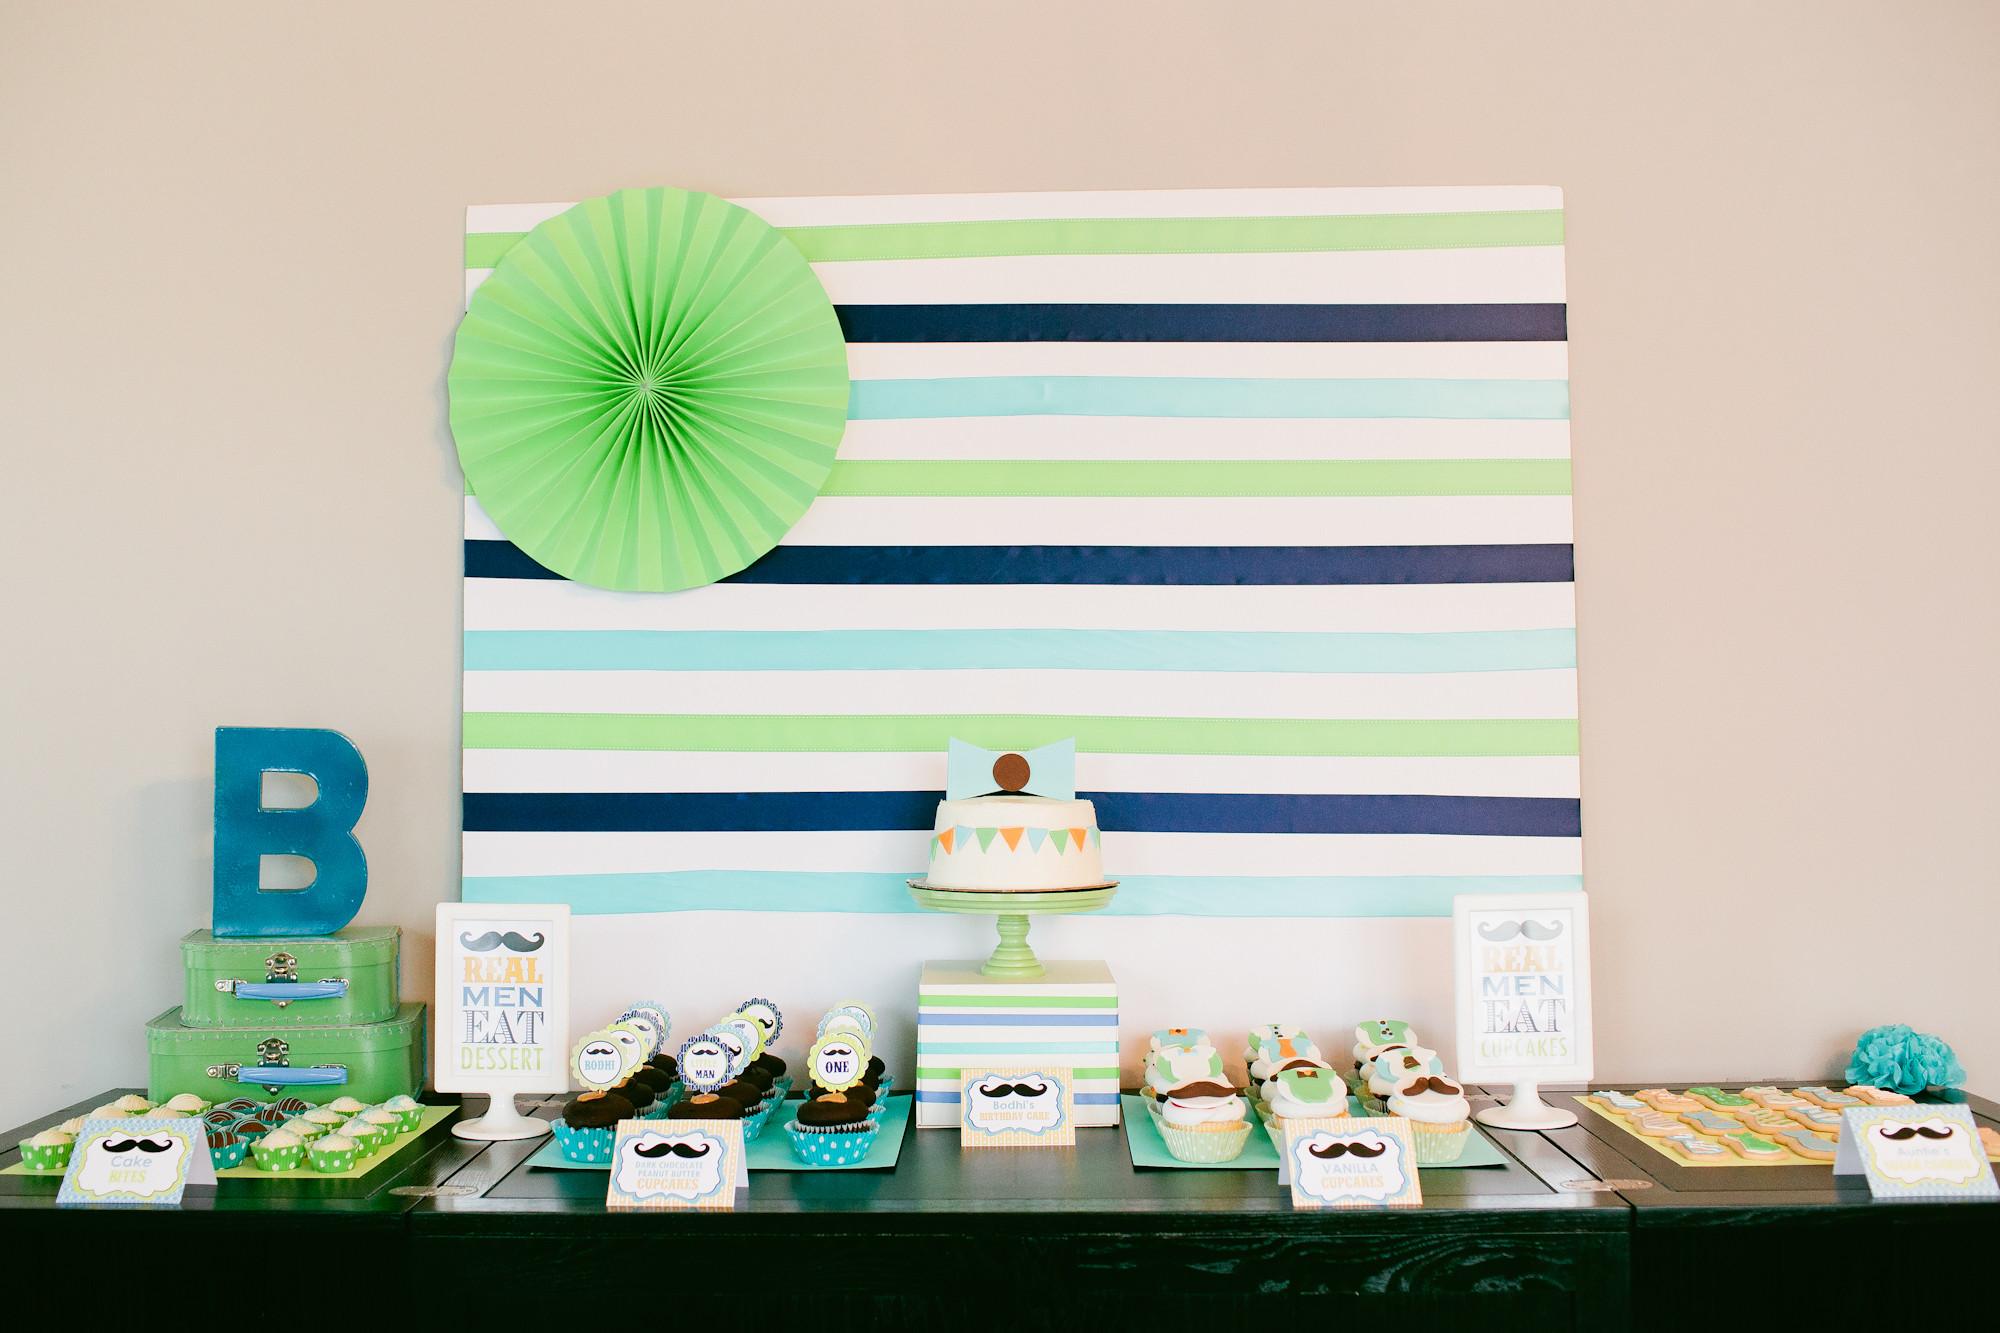 Dessert Table Backdrop  DIY Dessert table backdrop using ribbon